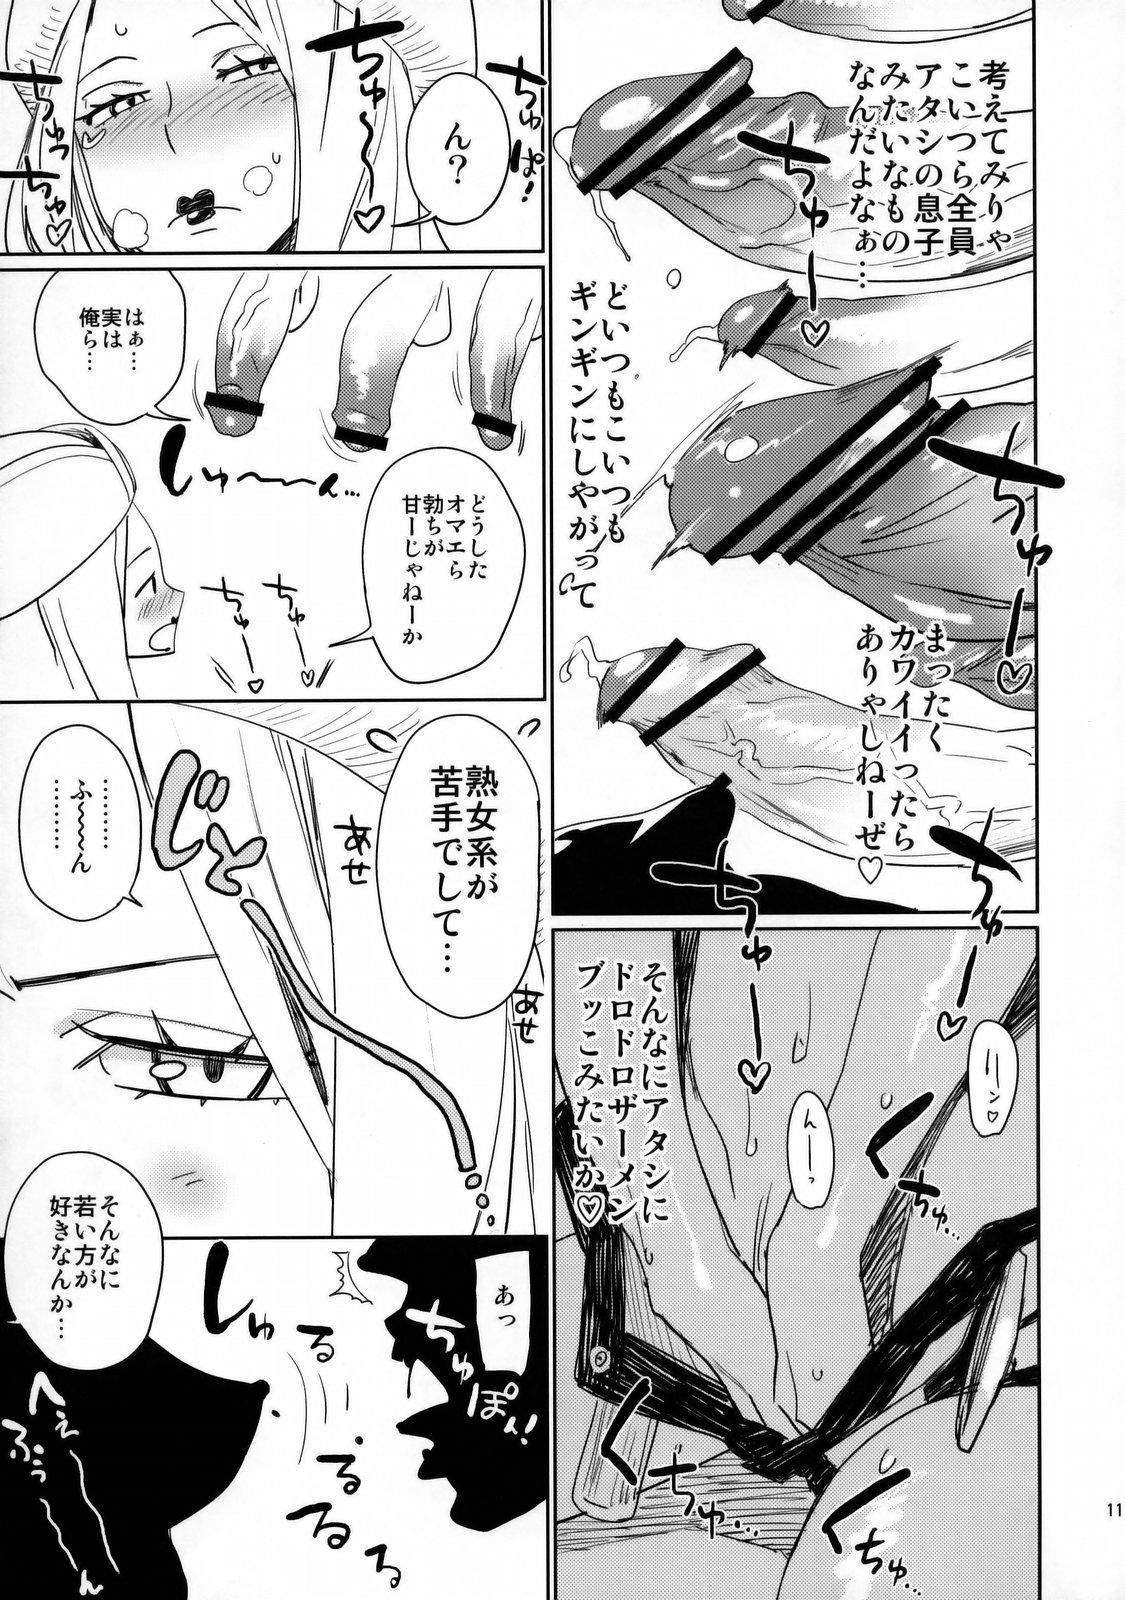 Abradeli Kamitaba No.05 140000000 9